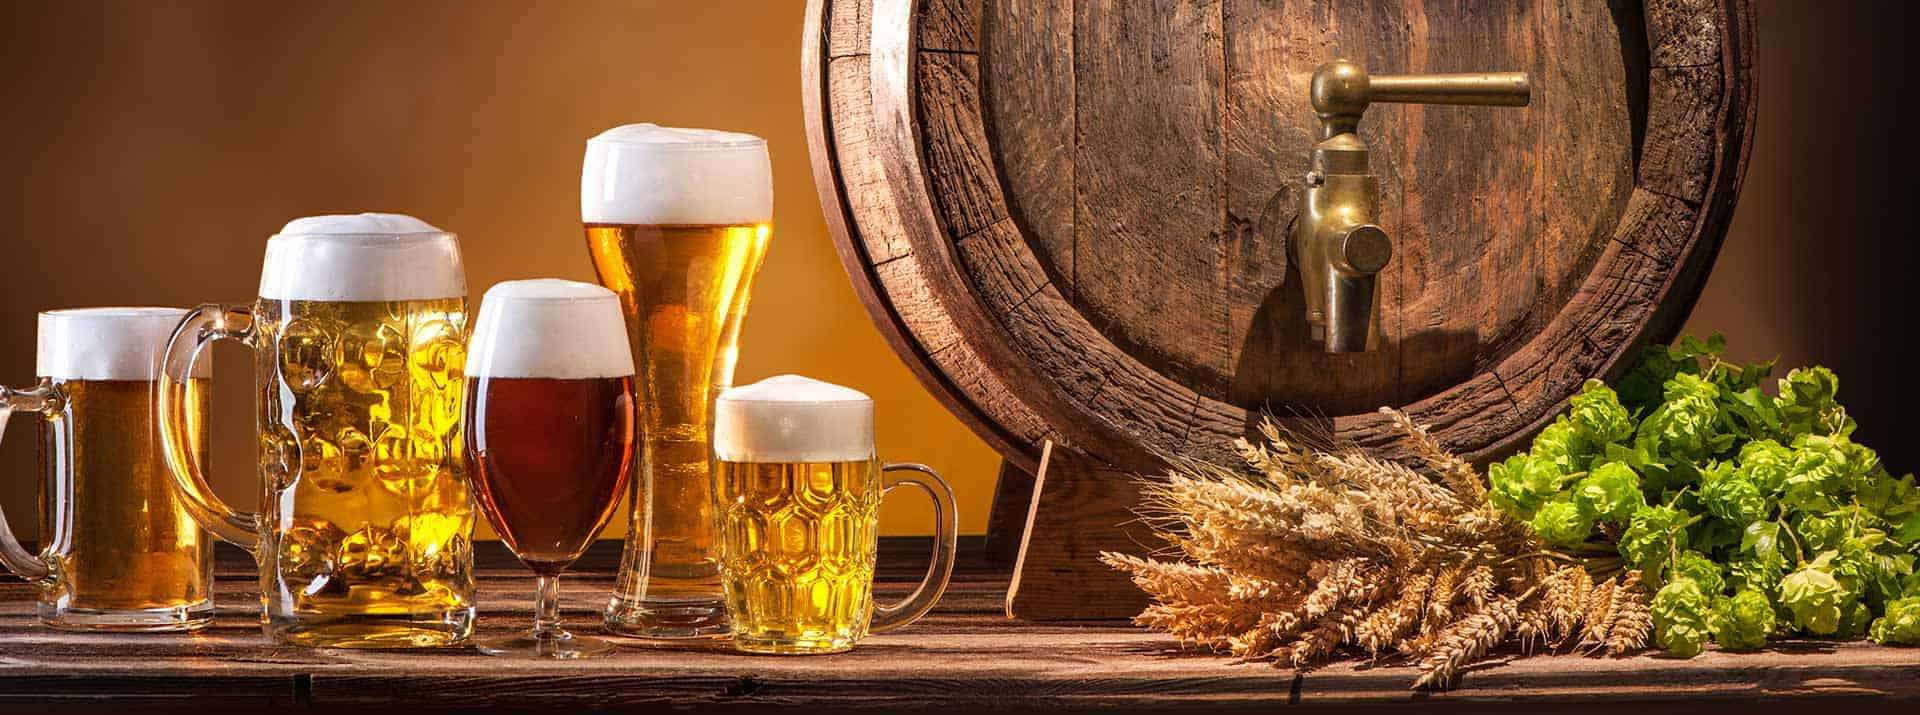 Weinkellerei Meraner Bier